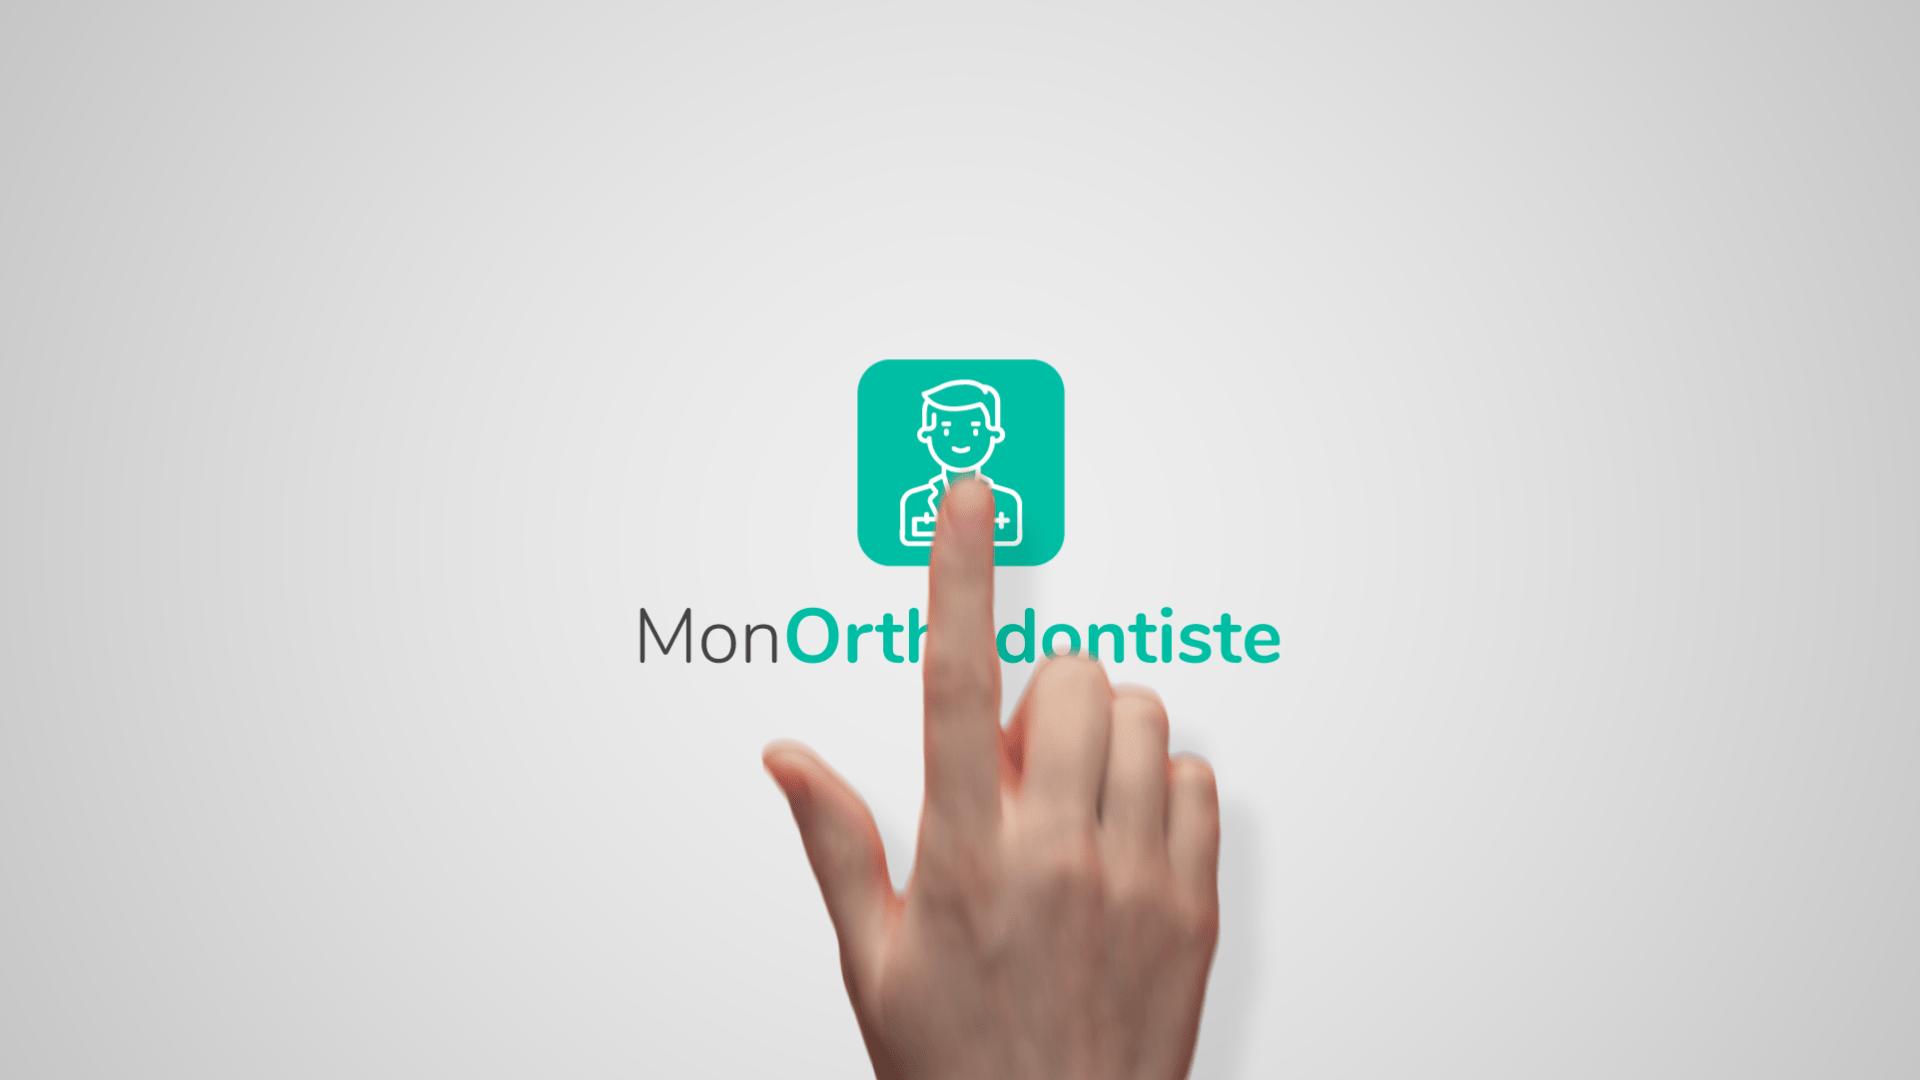 Présentation MonOrthodontiste